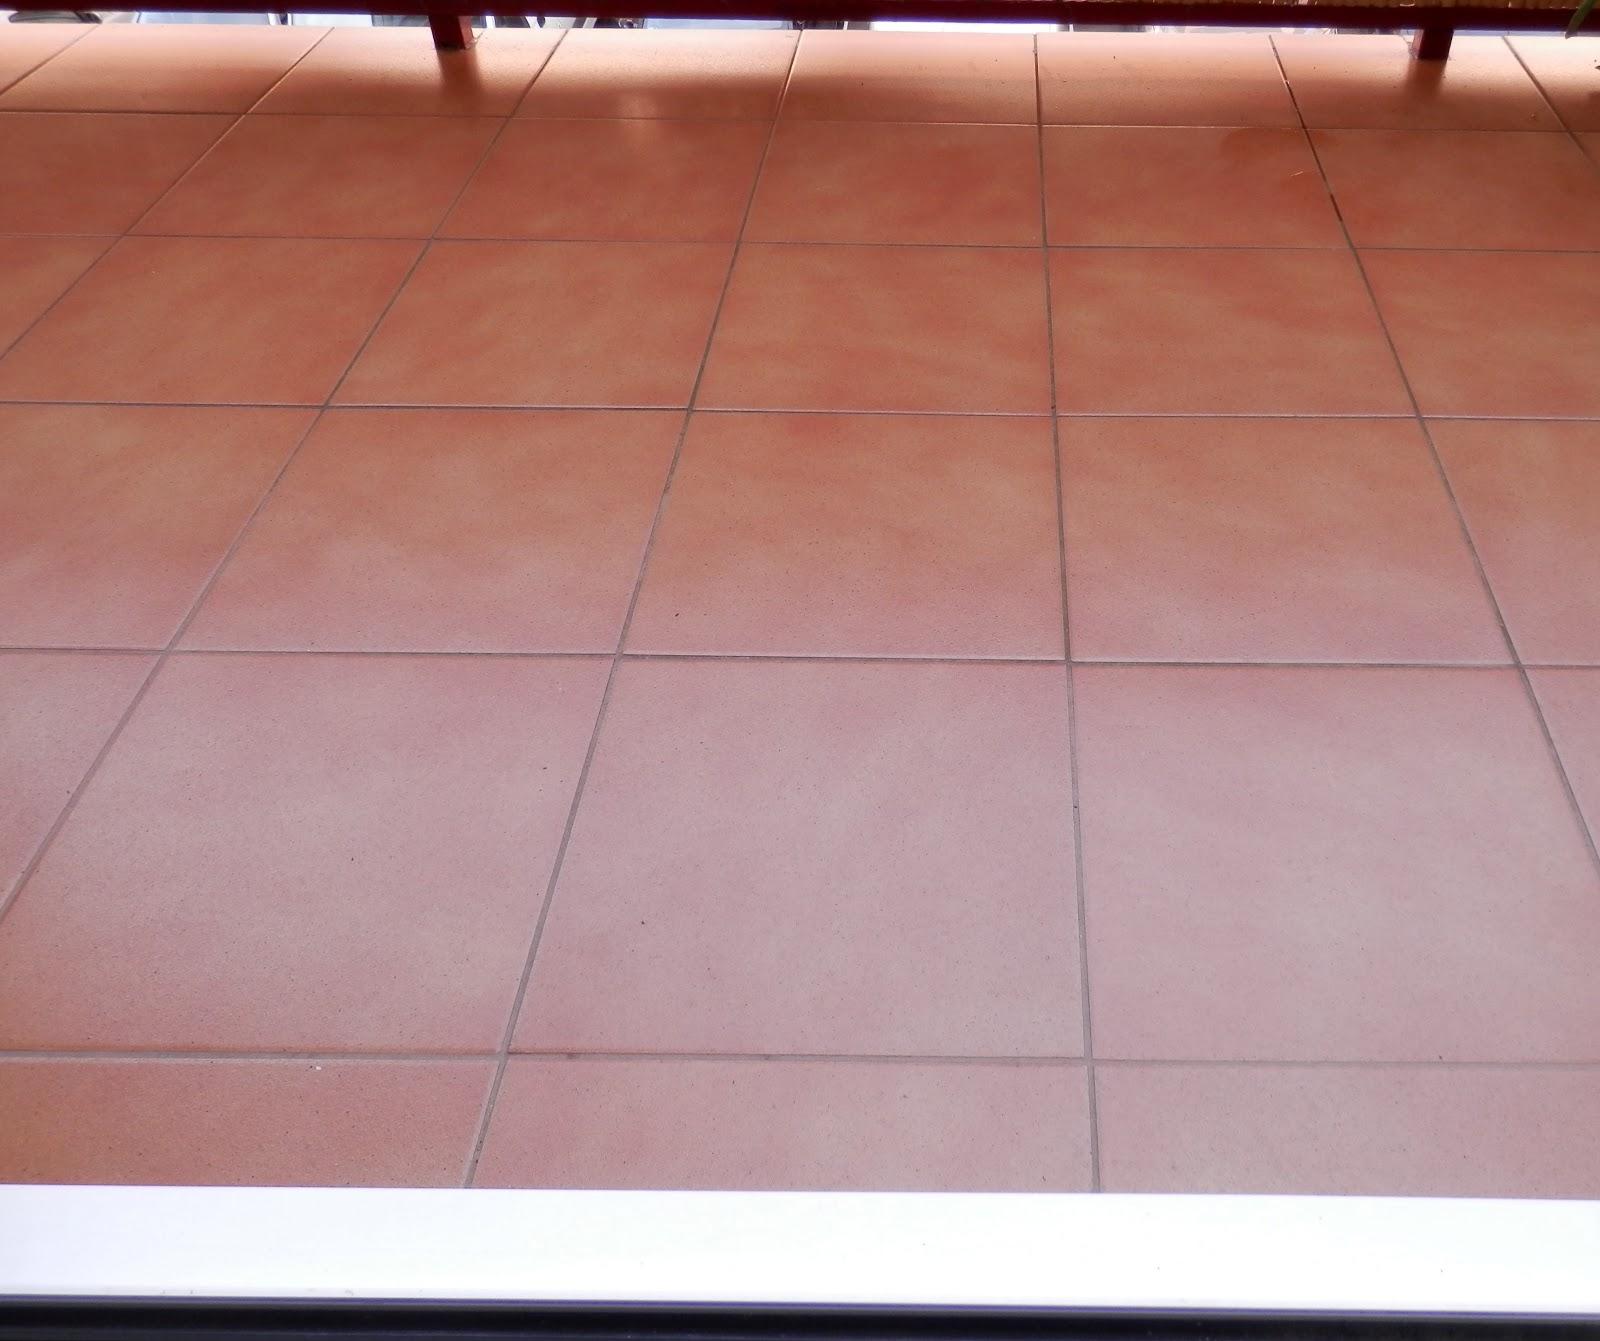 Trabajos y ocio cer mica para exteriores for Ceramica pared exterior